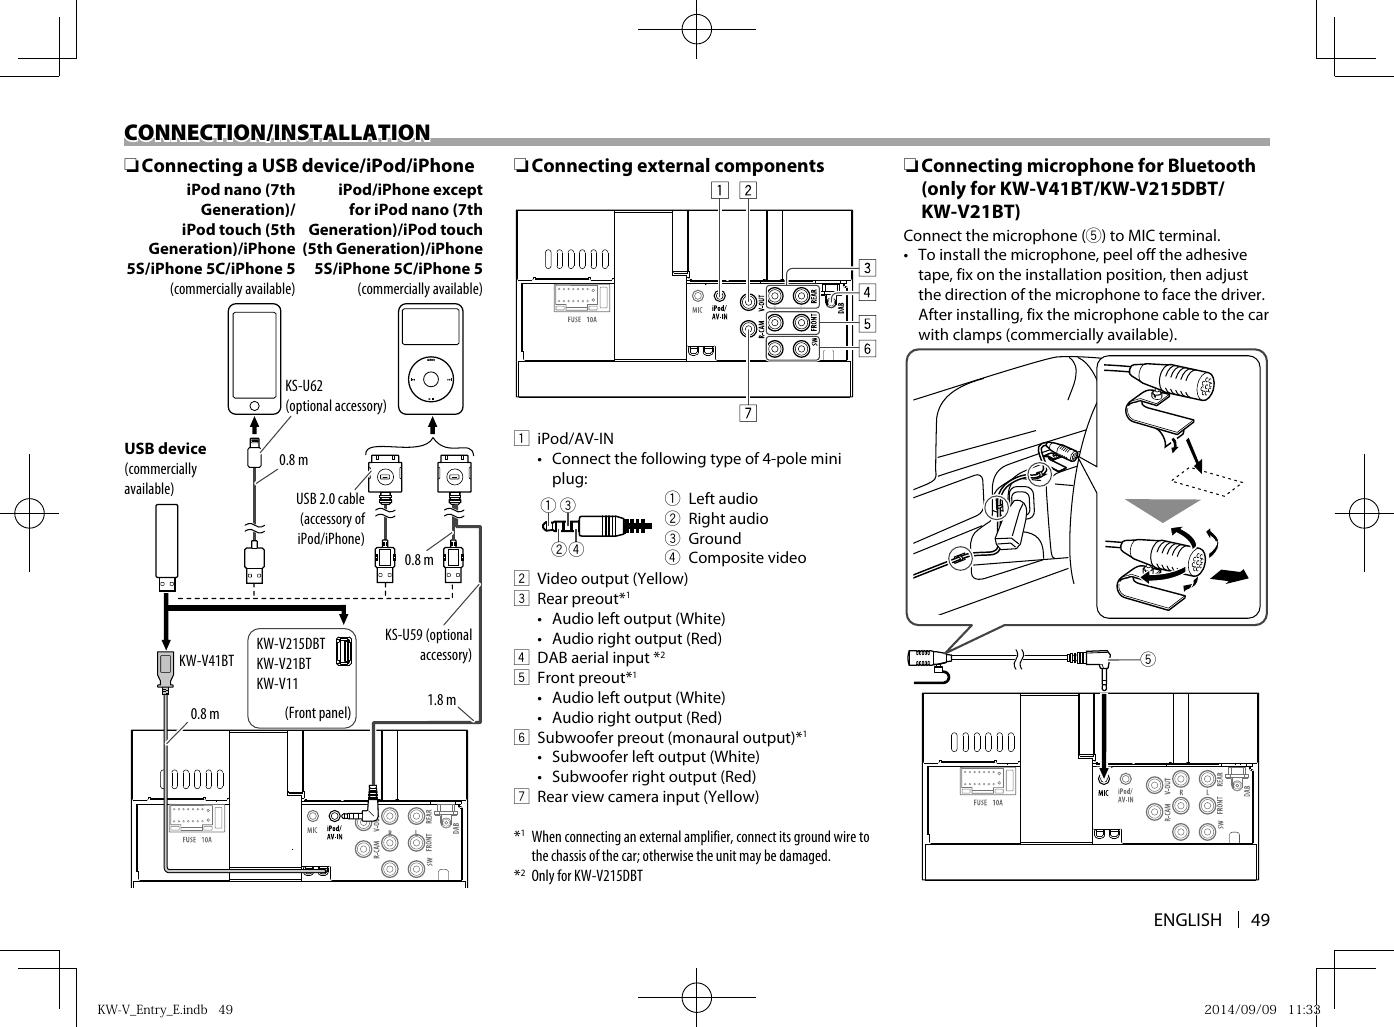 Jvc Kw-V21Bt Backup Camera Wiring Diagram from usermanual.wiki